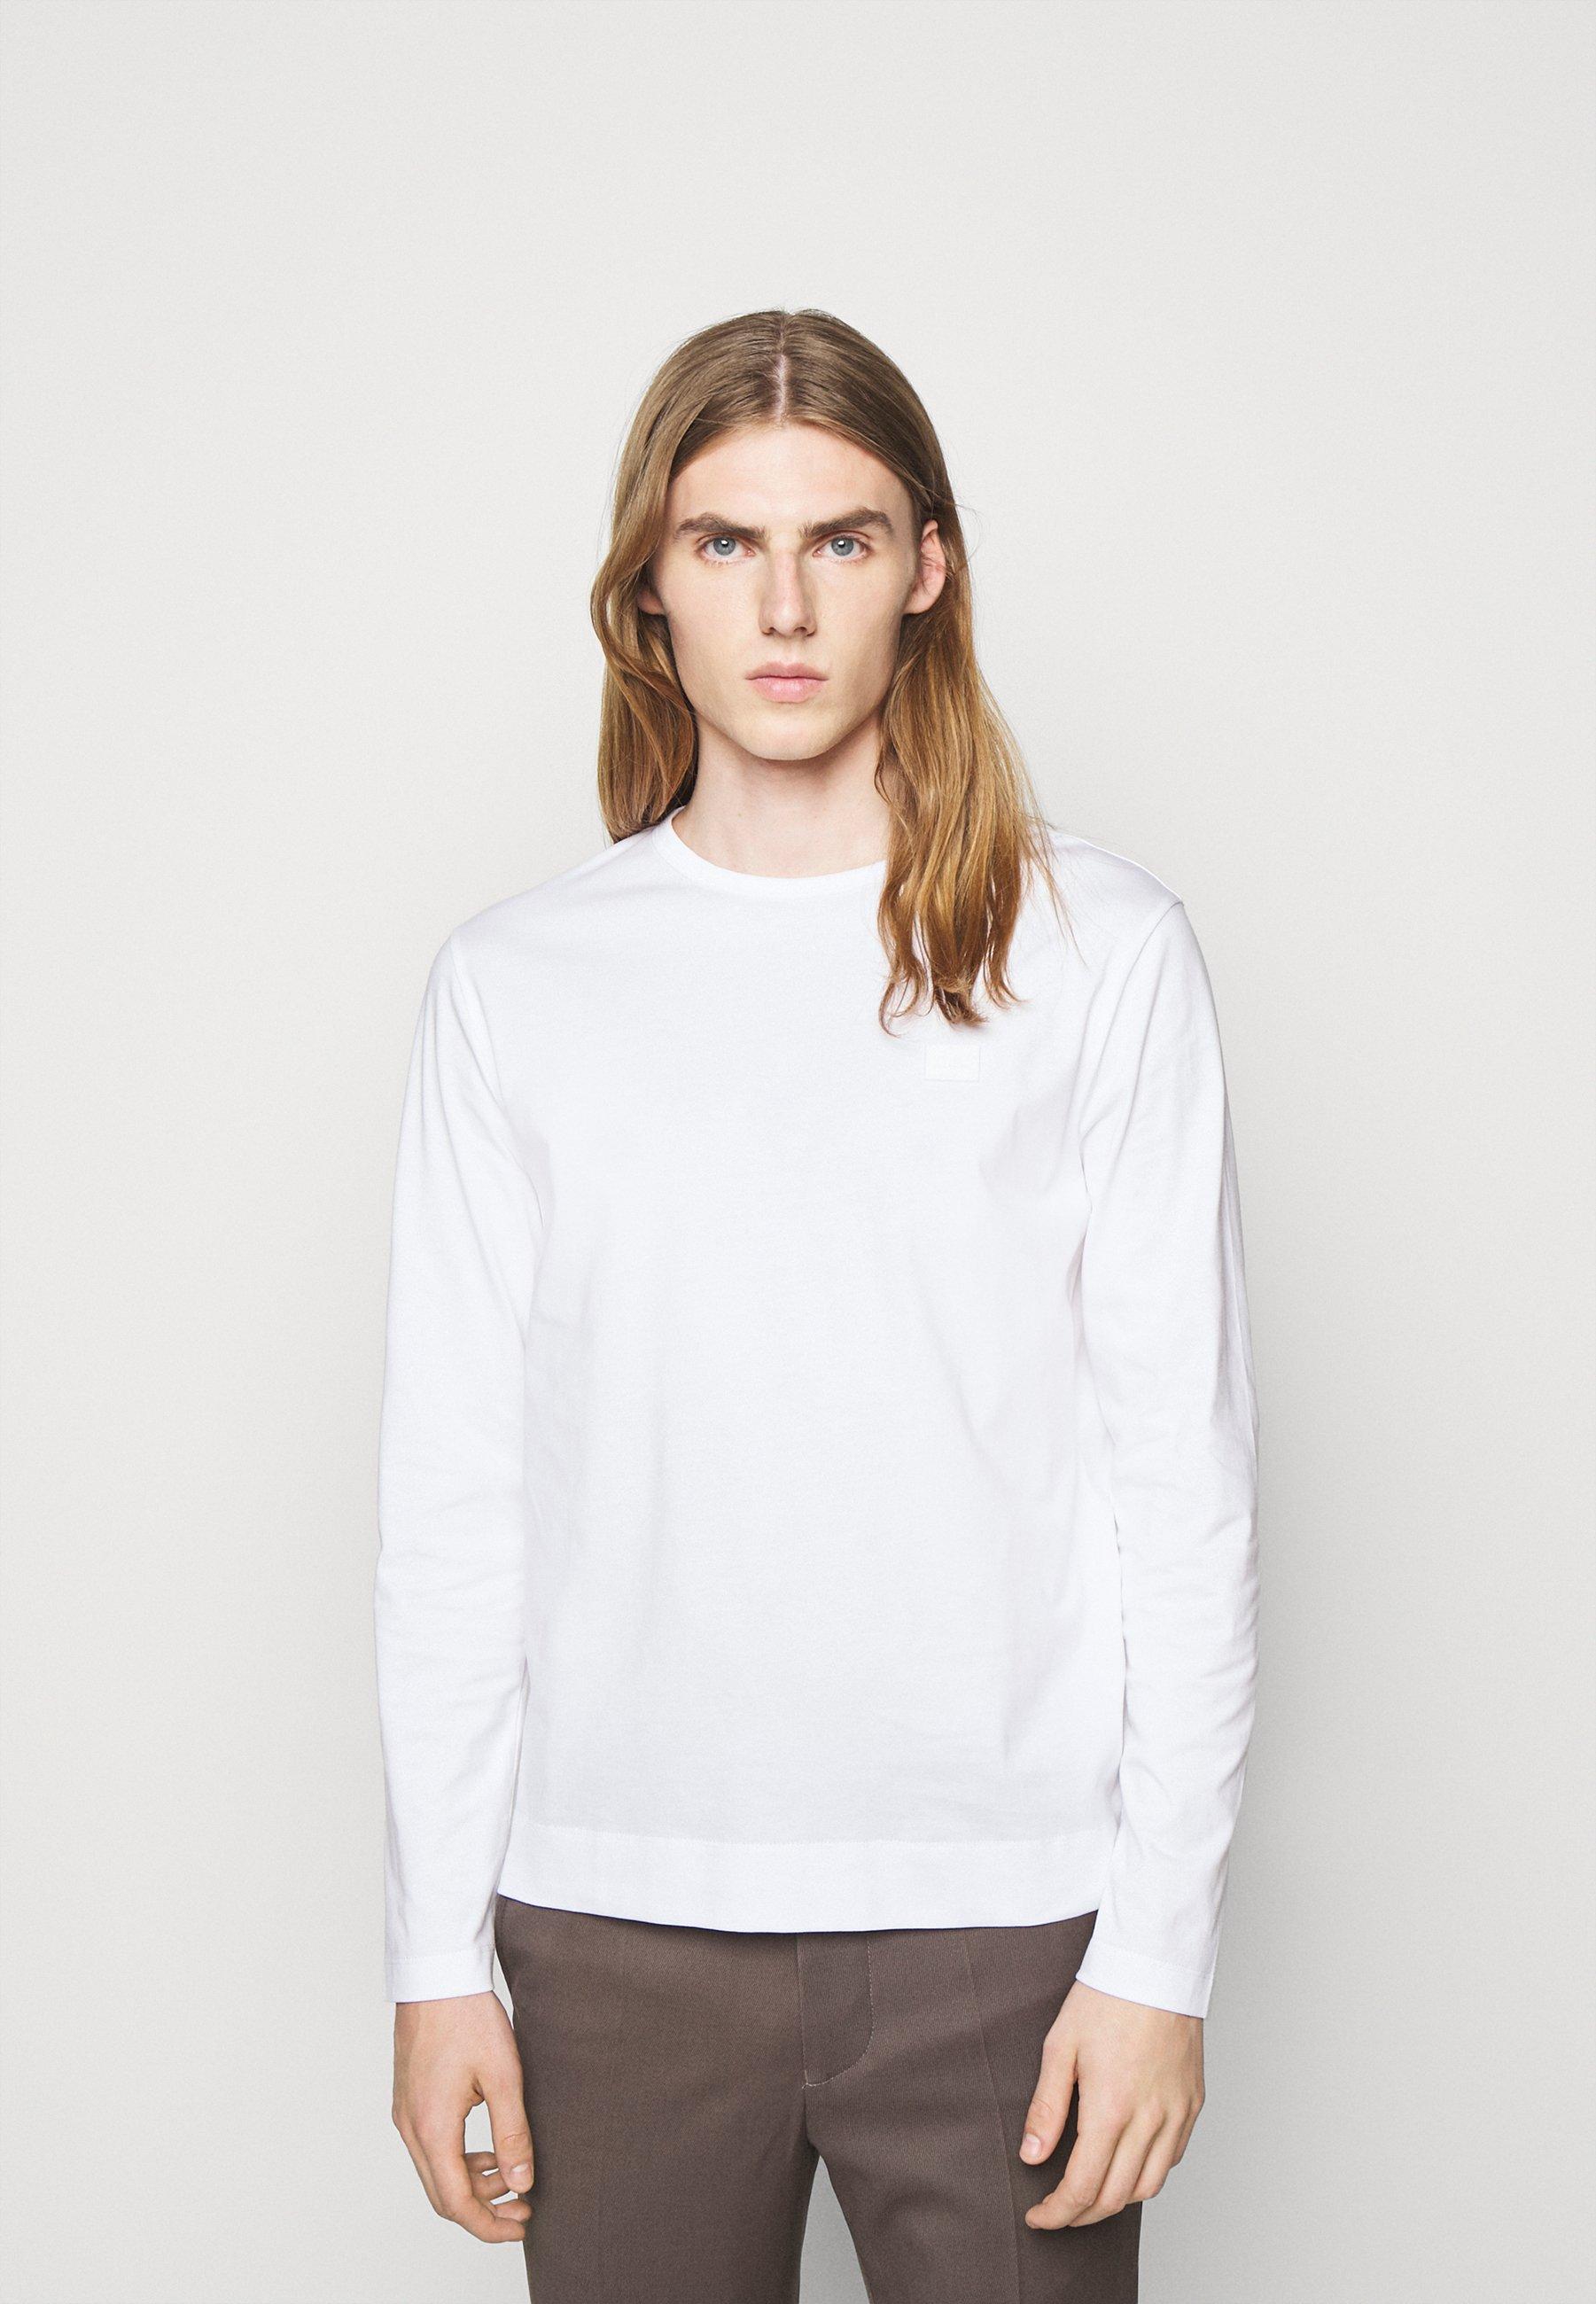 Homme CHARLIE LONG SLEEVE - T-shirt à manches longues